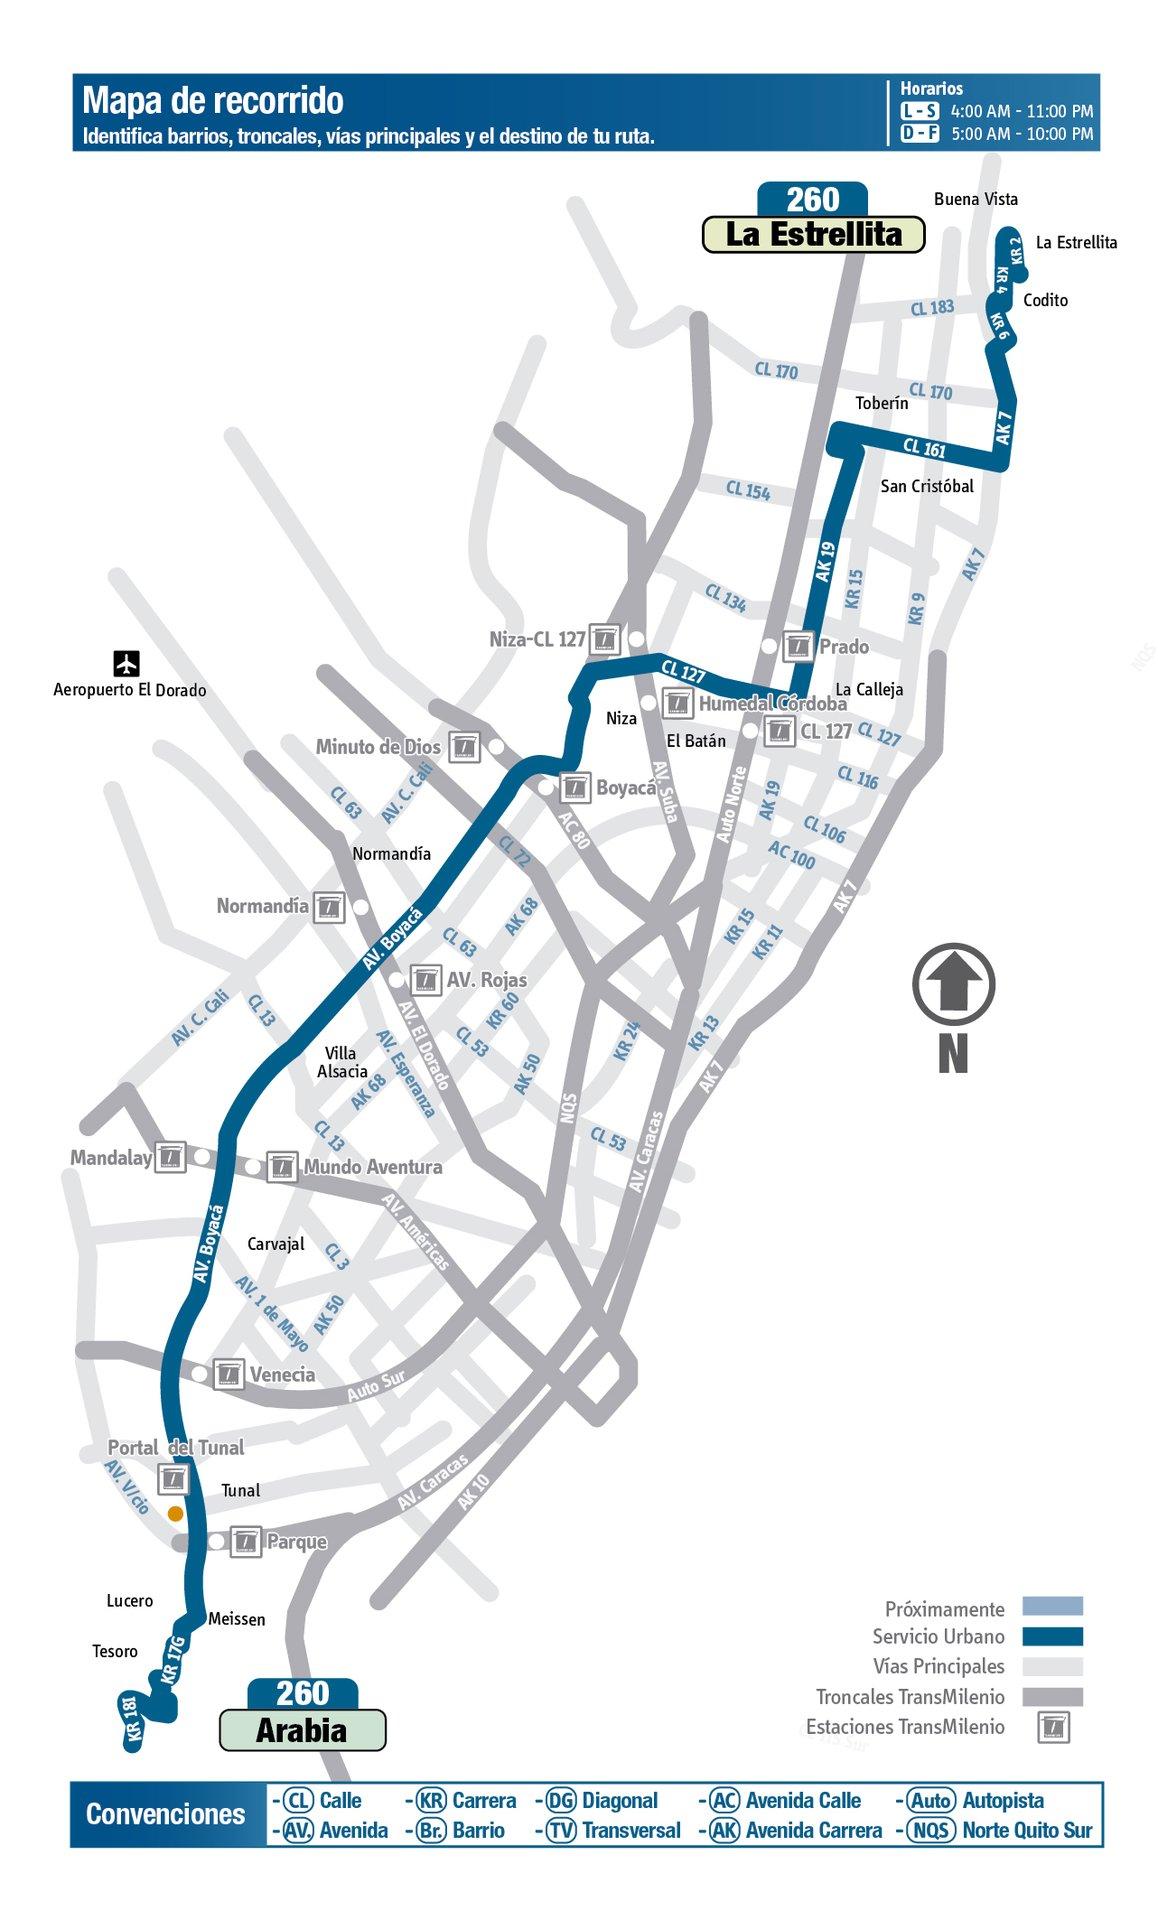 Ruta SITP: 260 La Estrellita ↔ Arabia [Urbana] 5